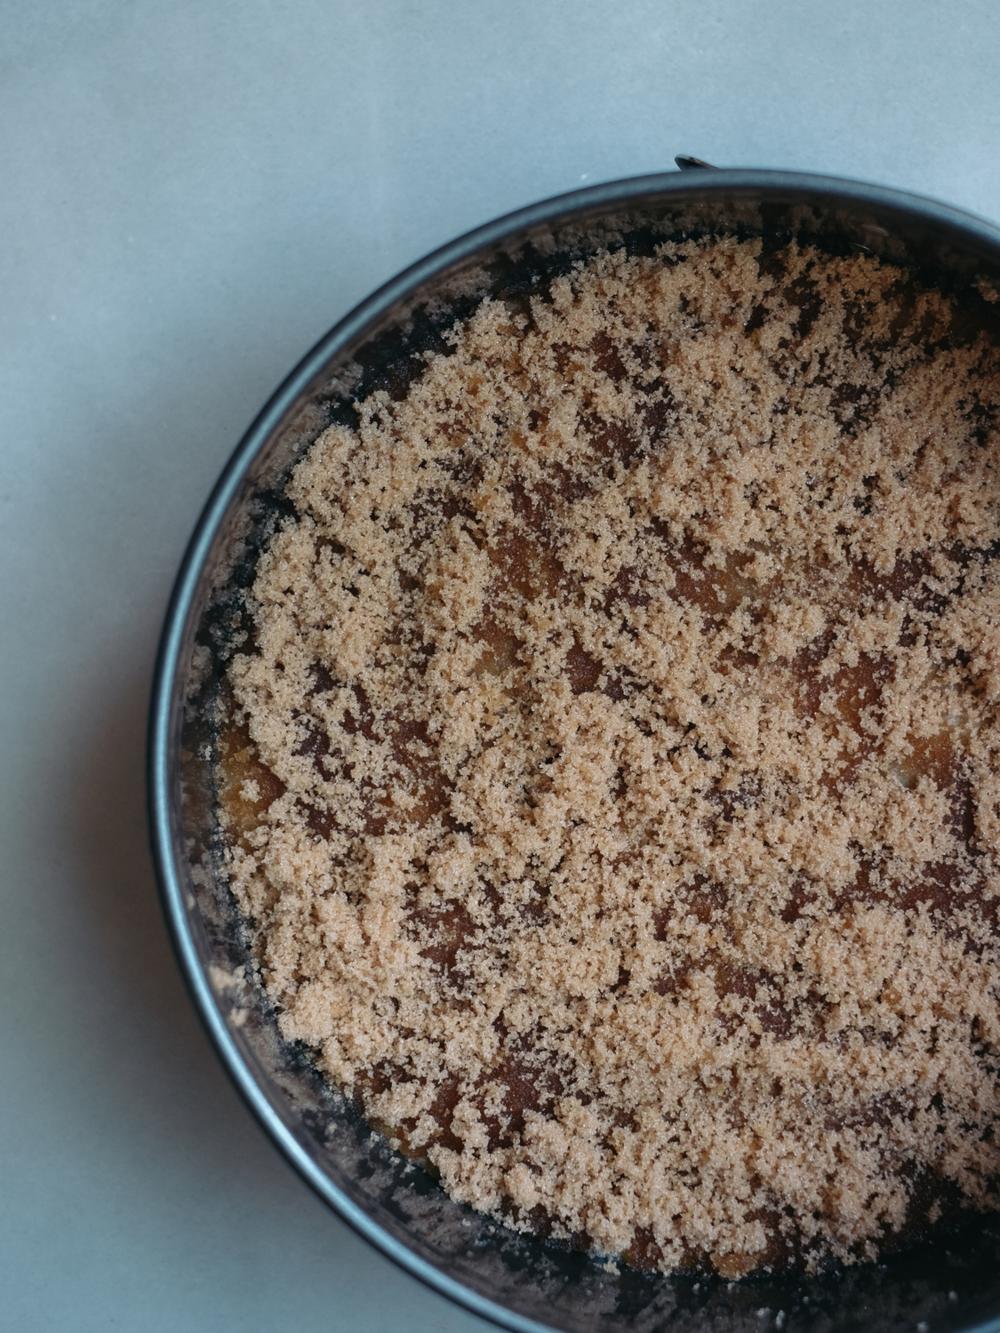 Persimmon-Thyme-Upside-Down-Cake-4.jpg